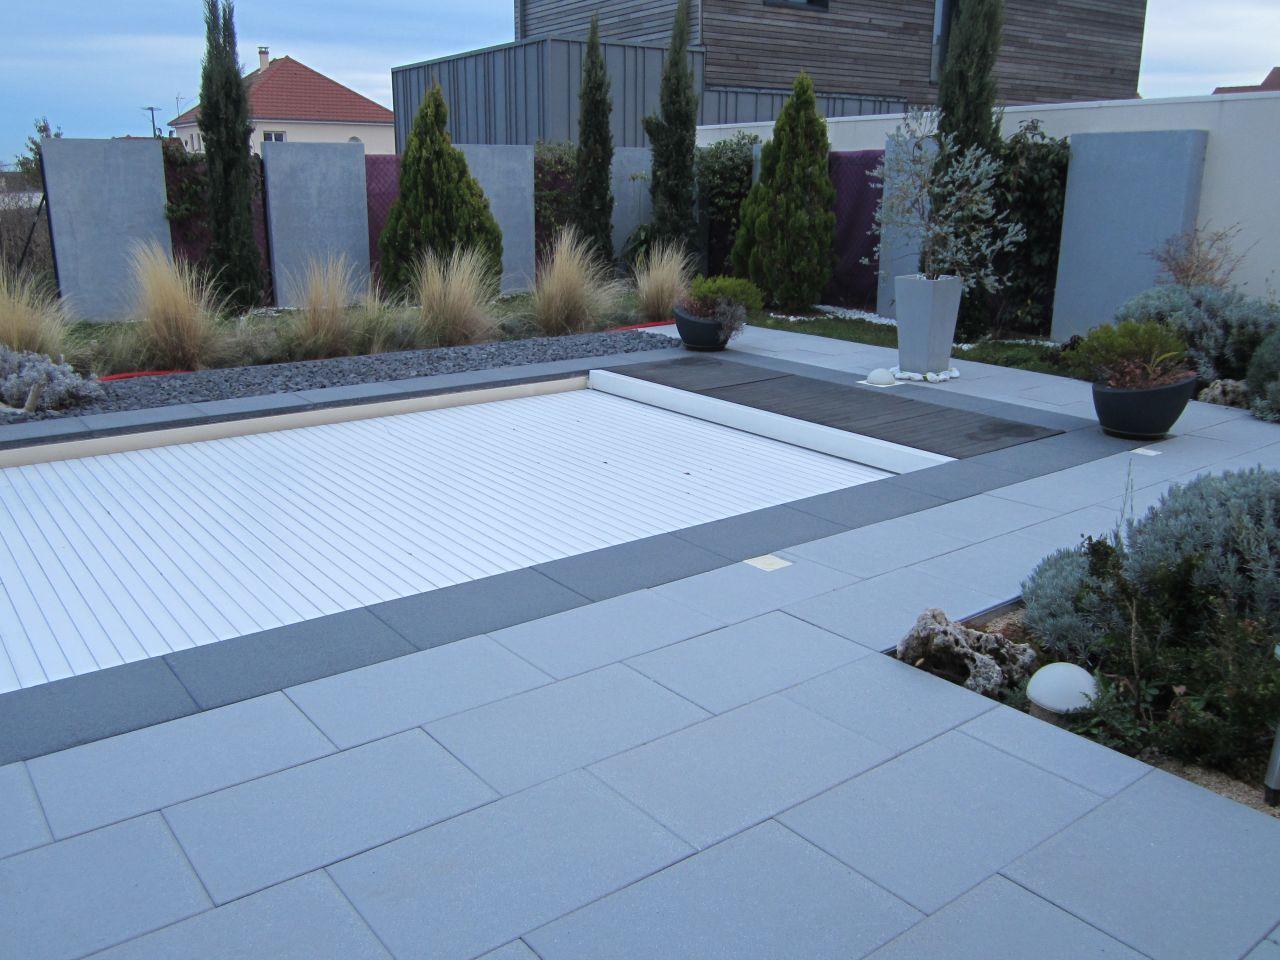 Terrasse autour de la piscine dalle arcadia premium de for Dalle piscine